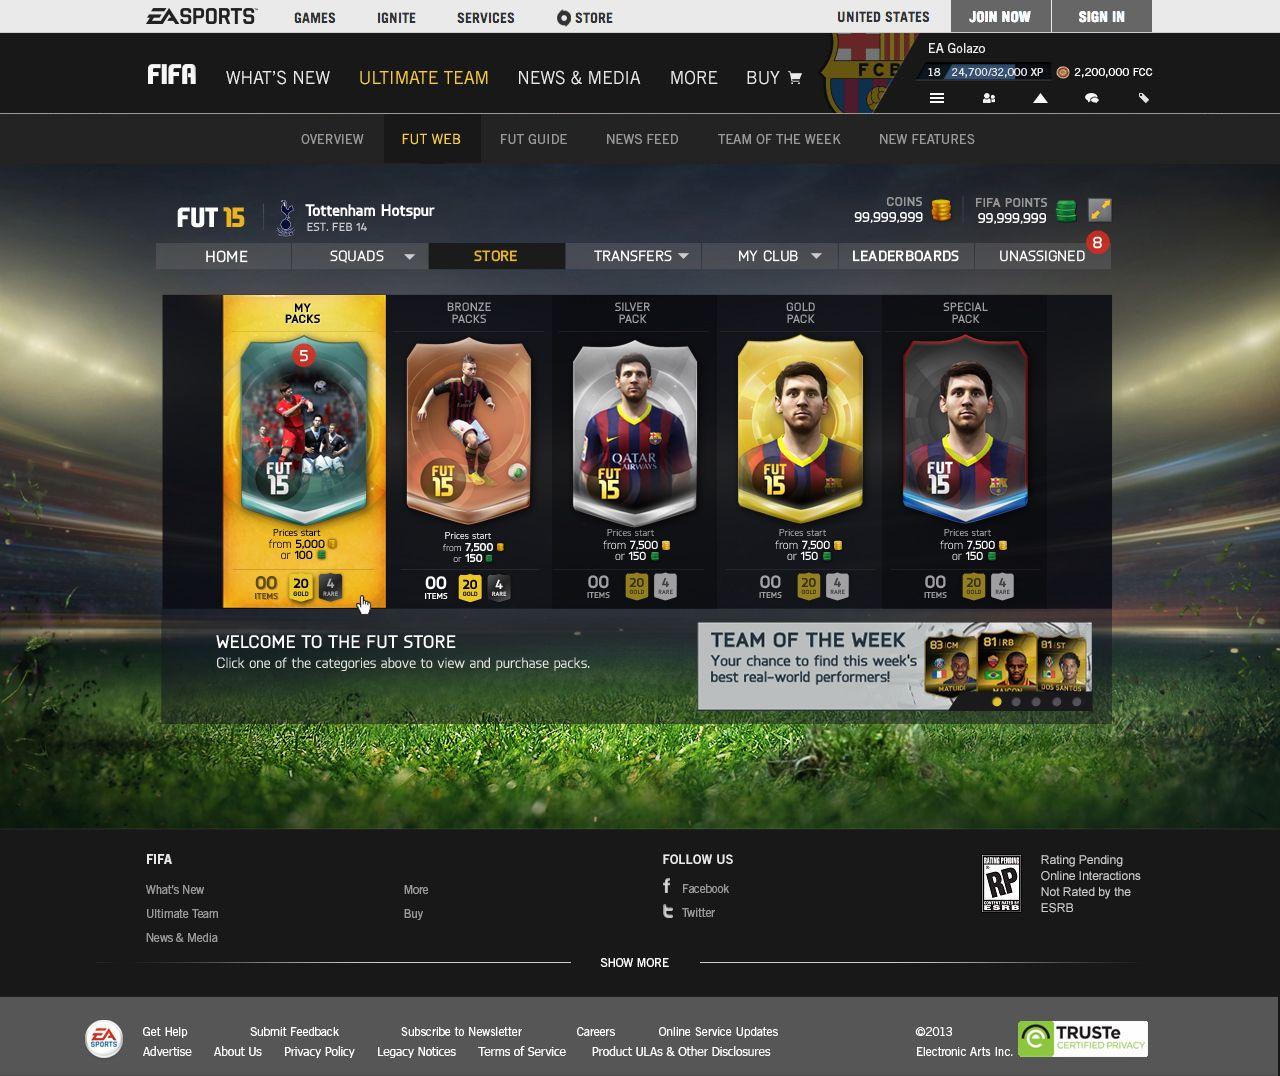 FIFA 15 ULTIMATE TEAM WEB APP jss Ea fifa